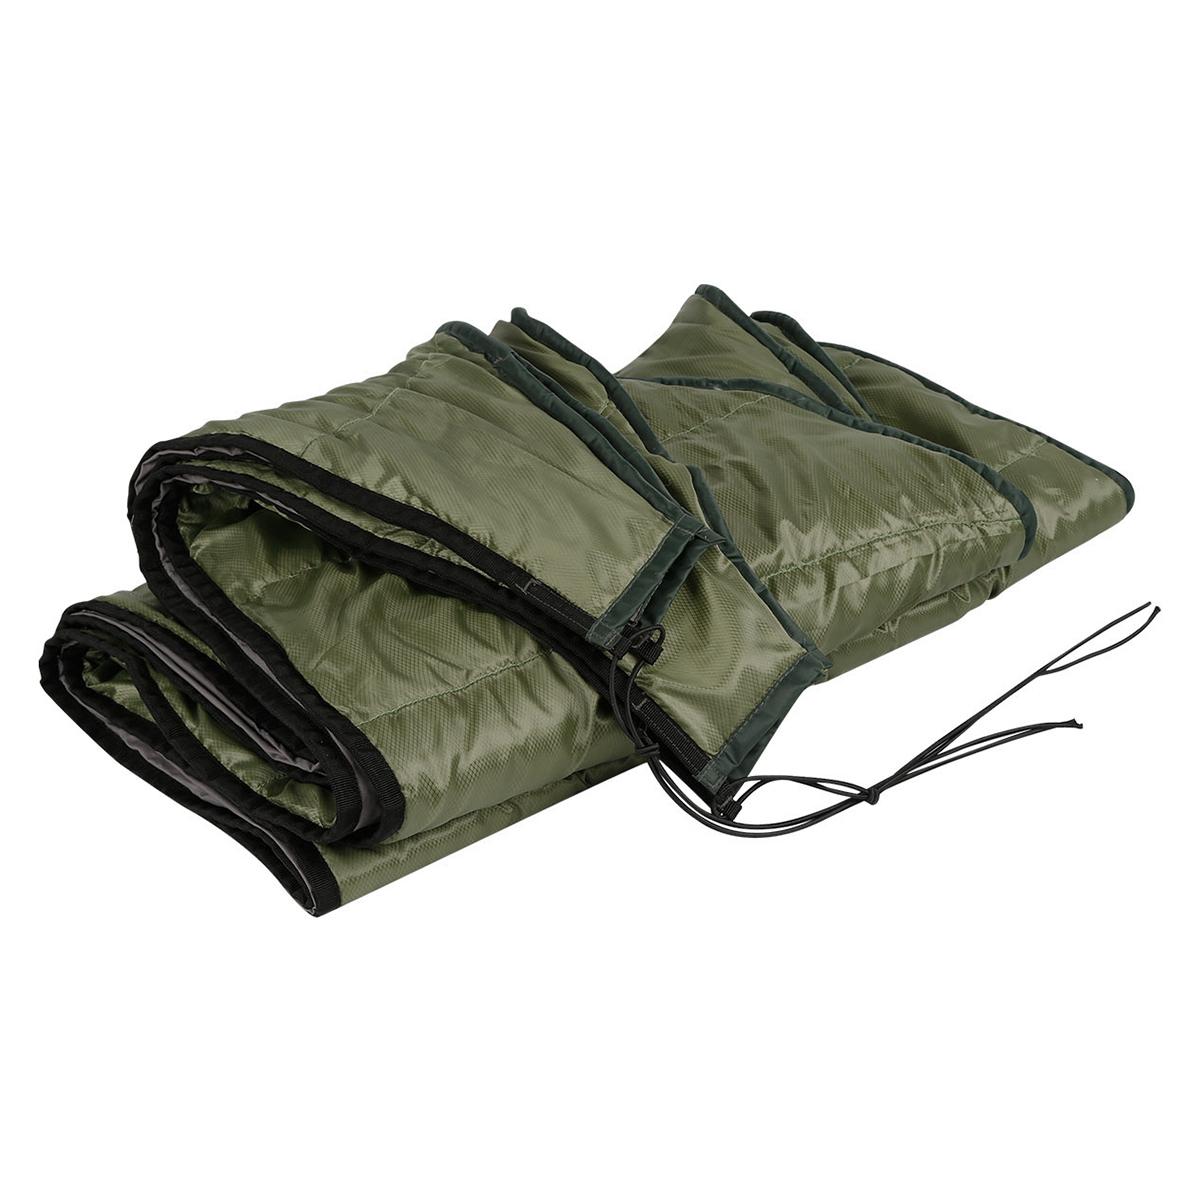 New Length Hammock Underquilt Ultralight Camping Hiking